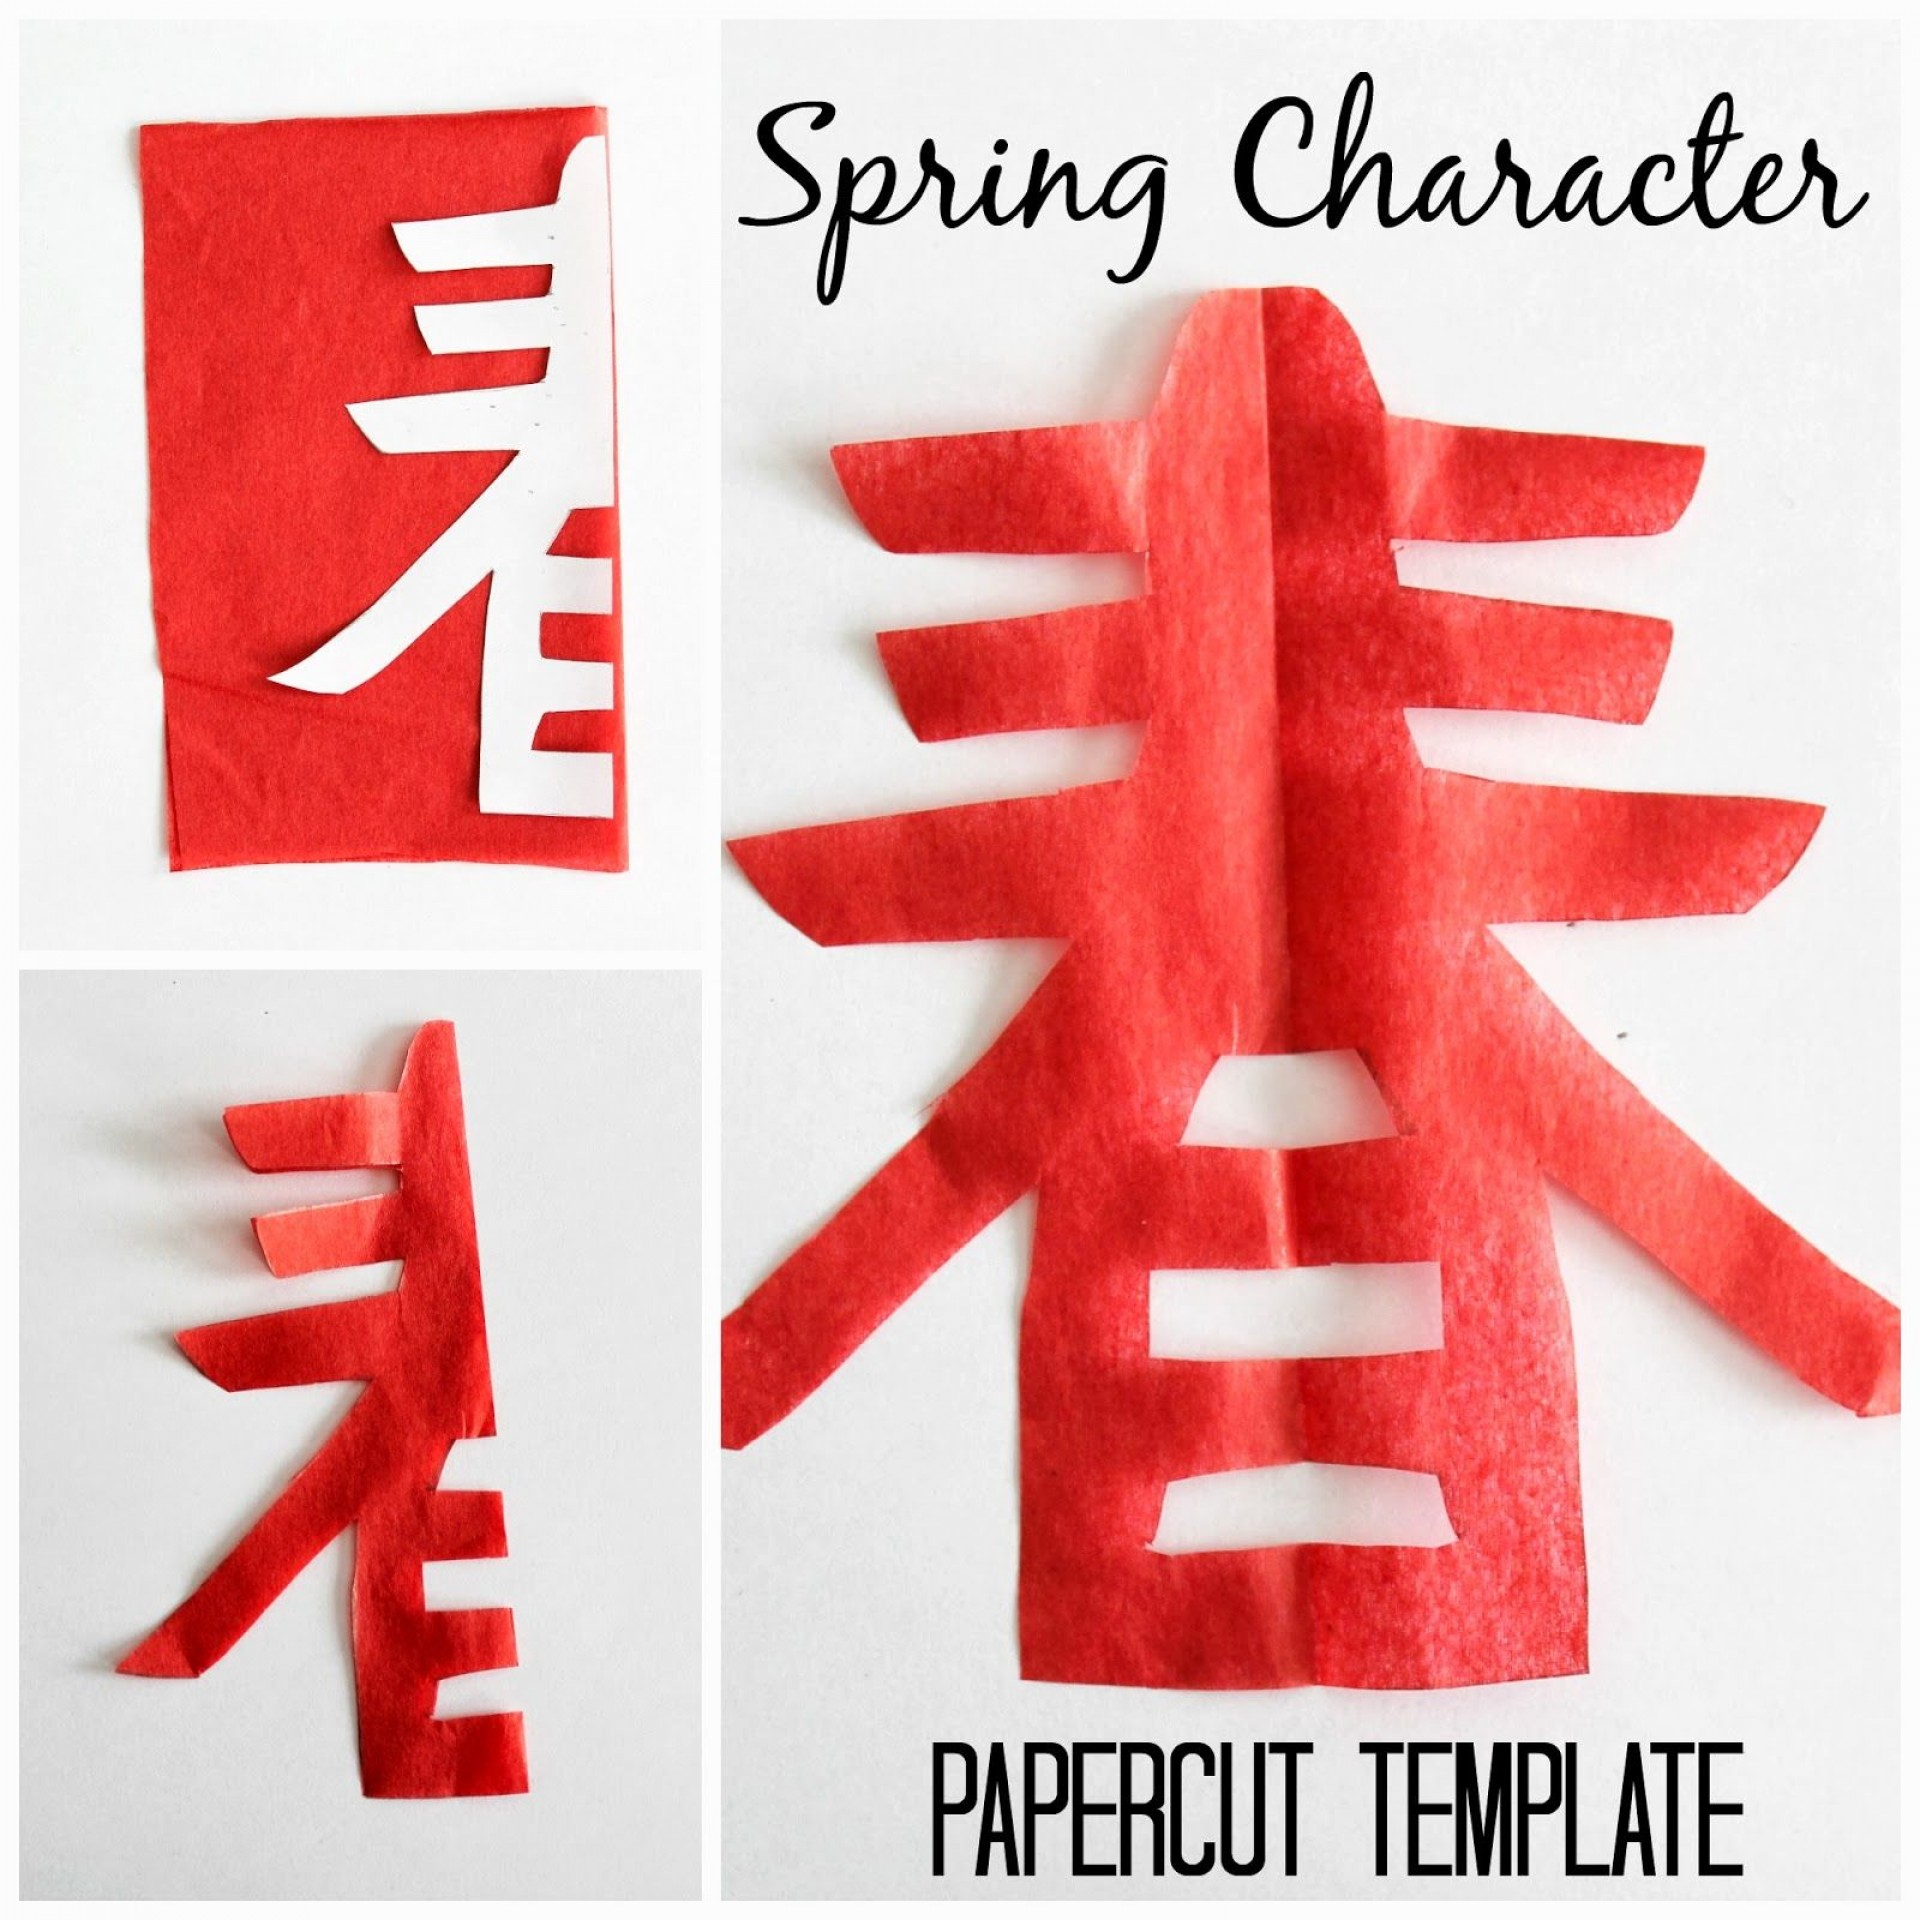 003 Wondrou Chinese Paper Cutting Template Photo  Pdf Dragon1920